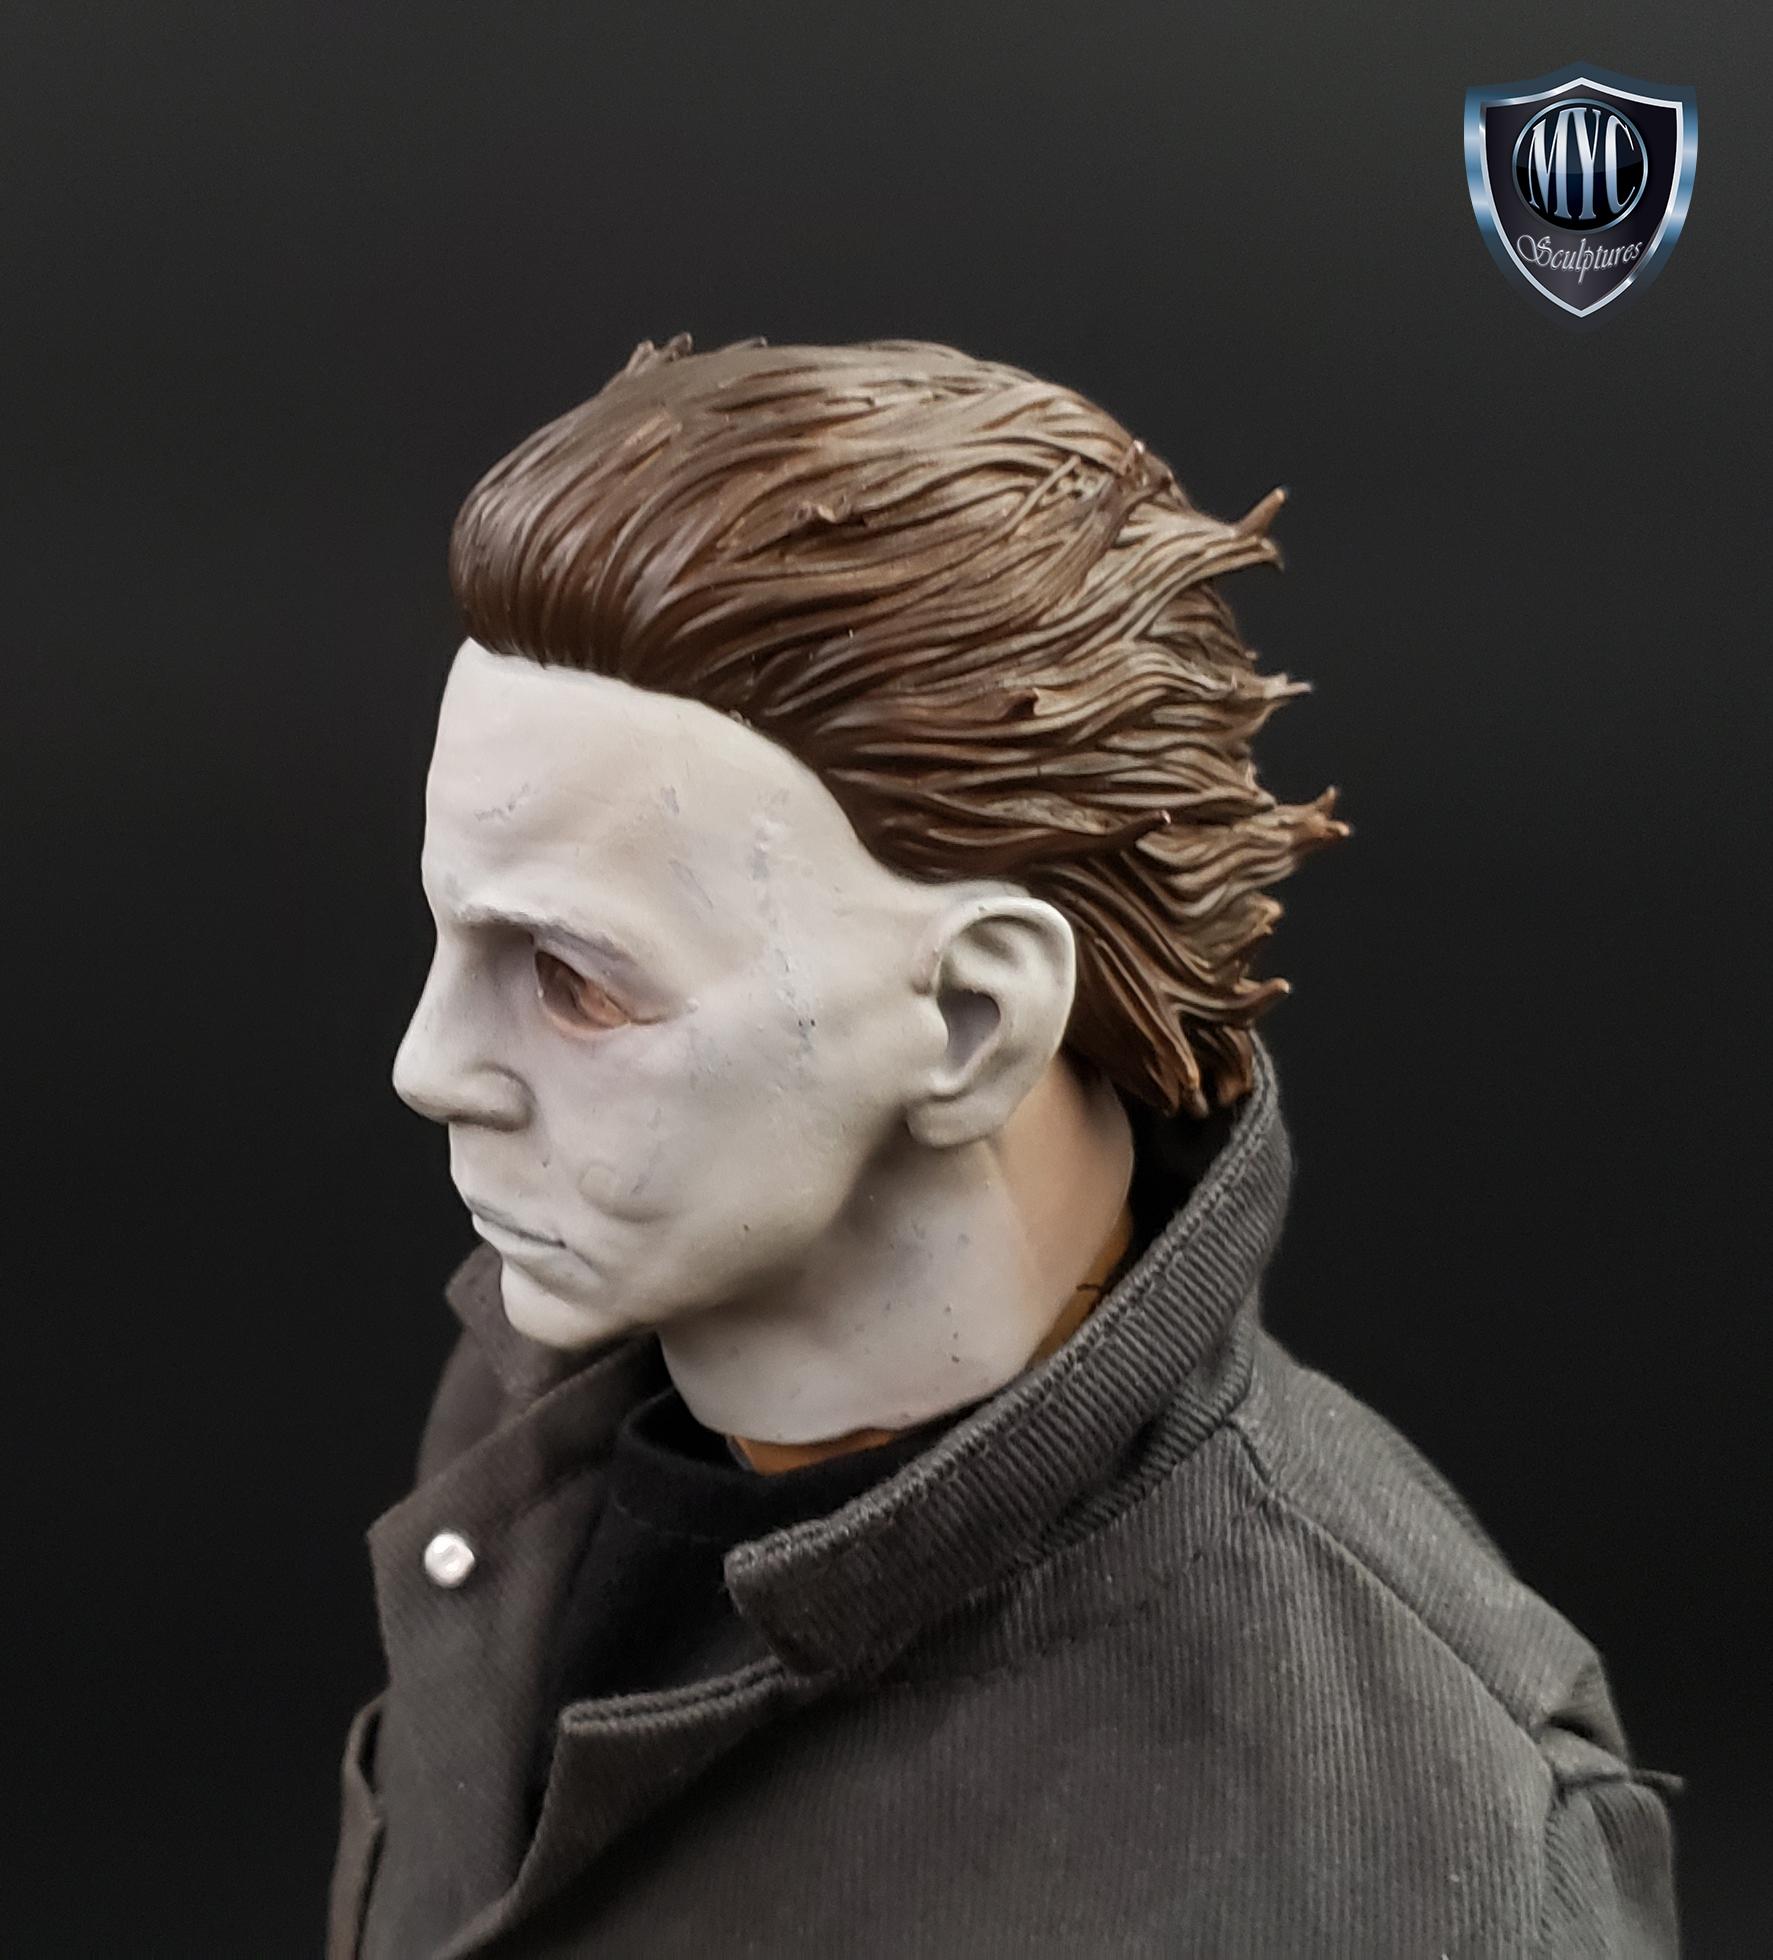 Michael_Myers_Custom_Statue_09